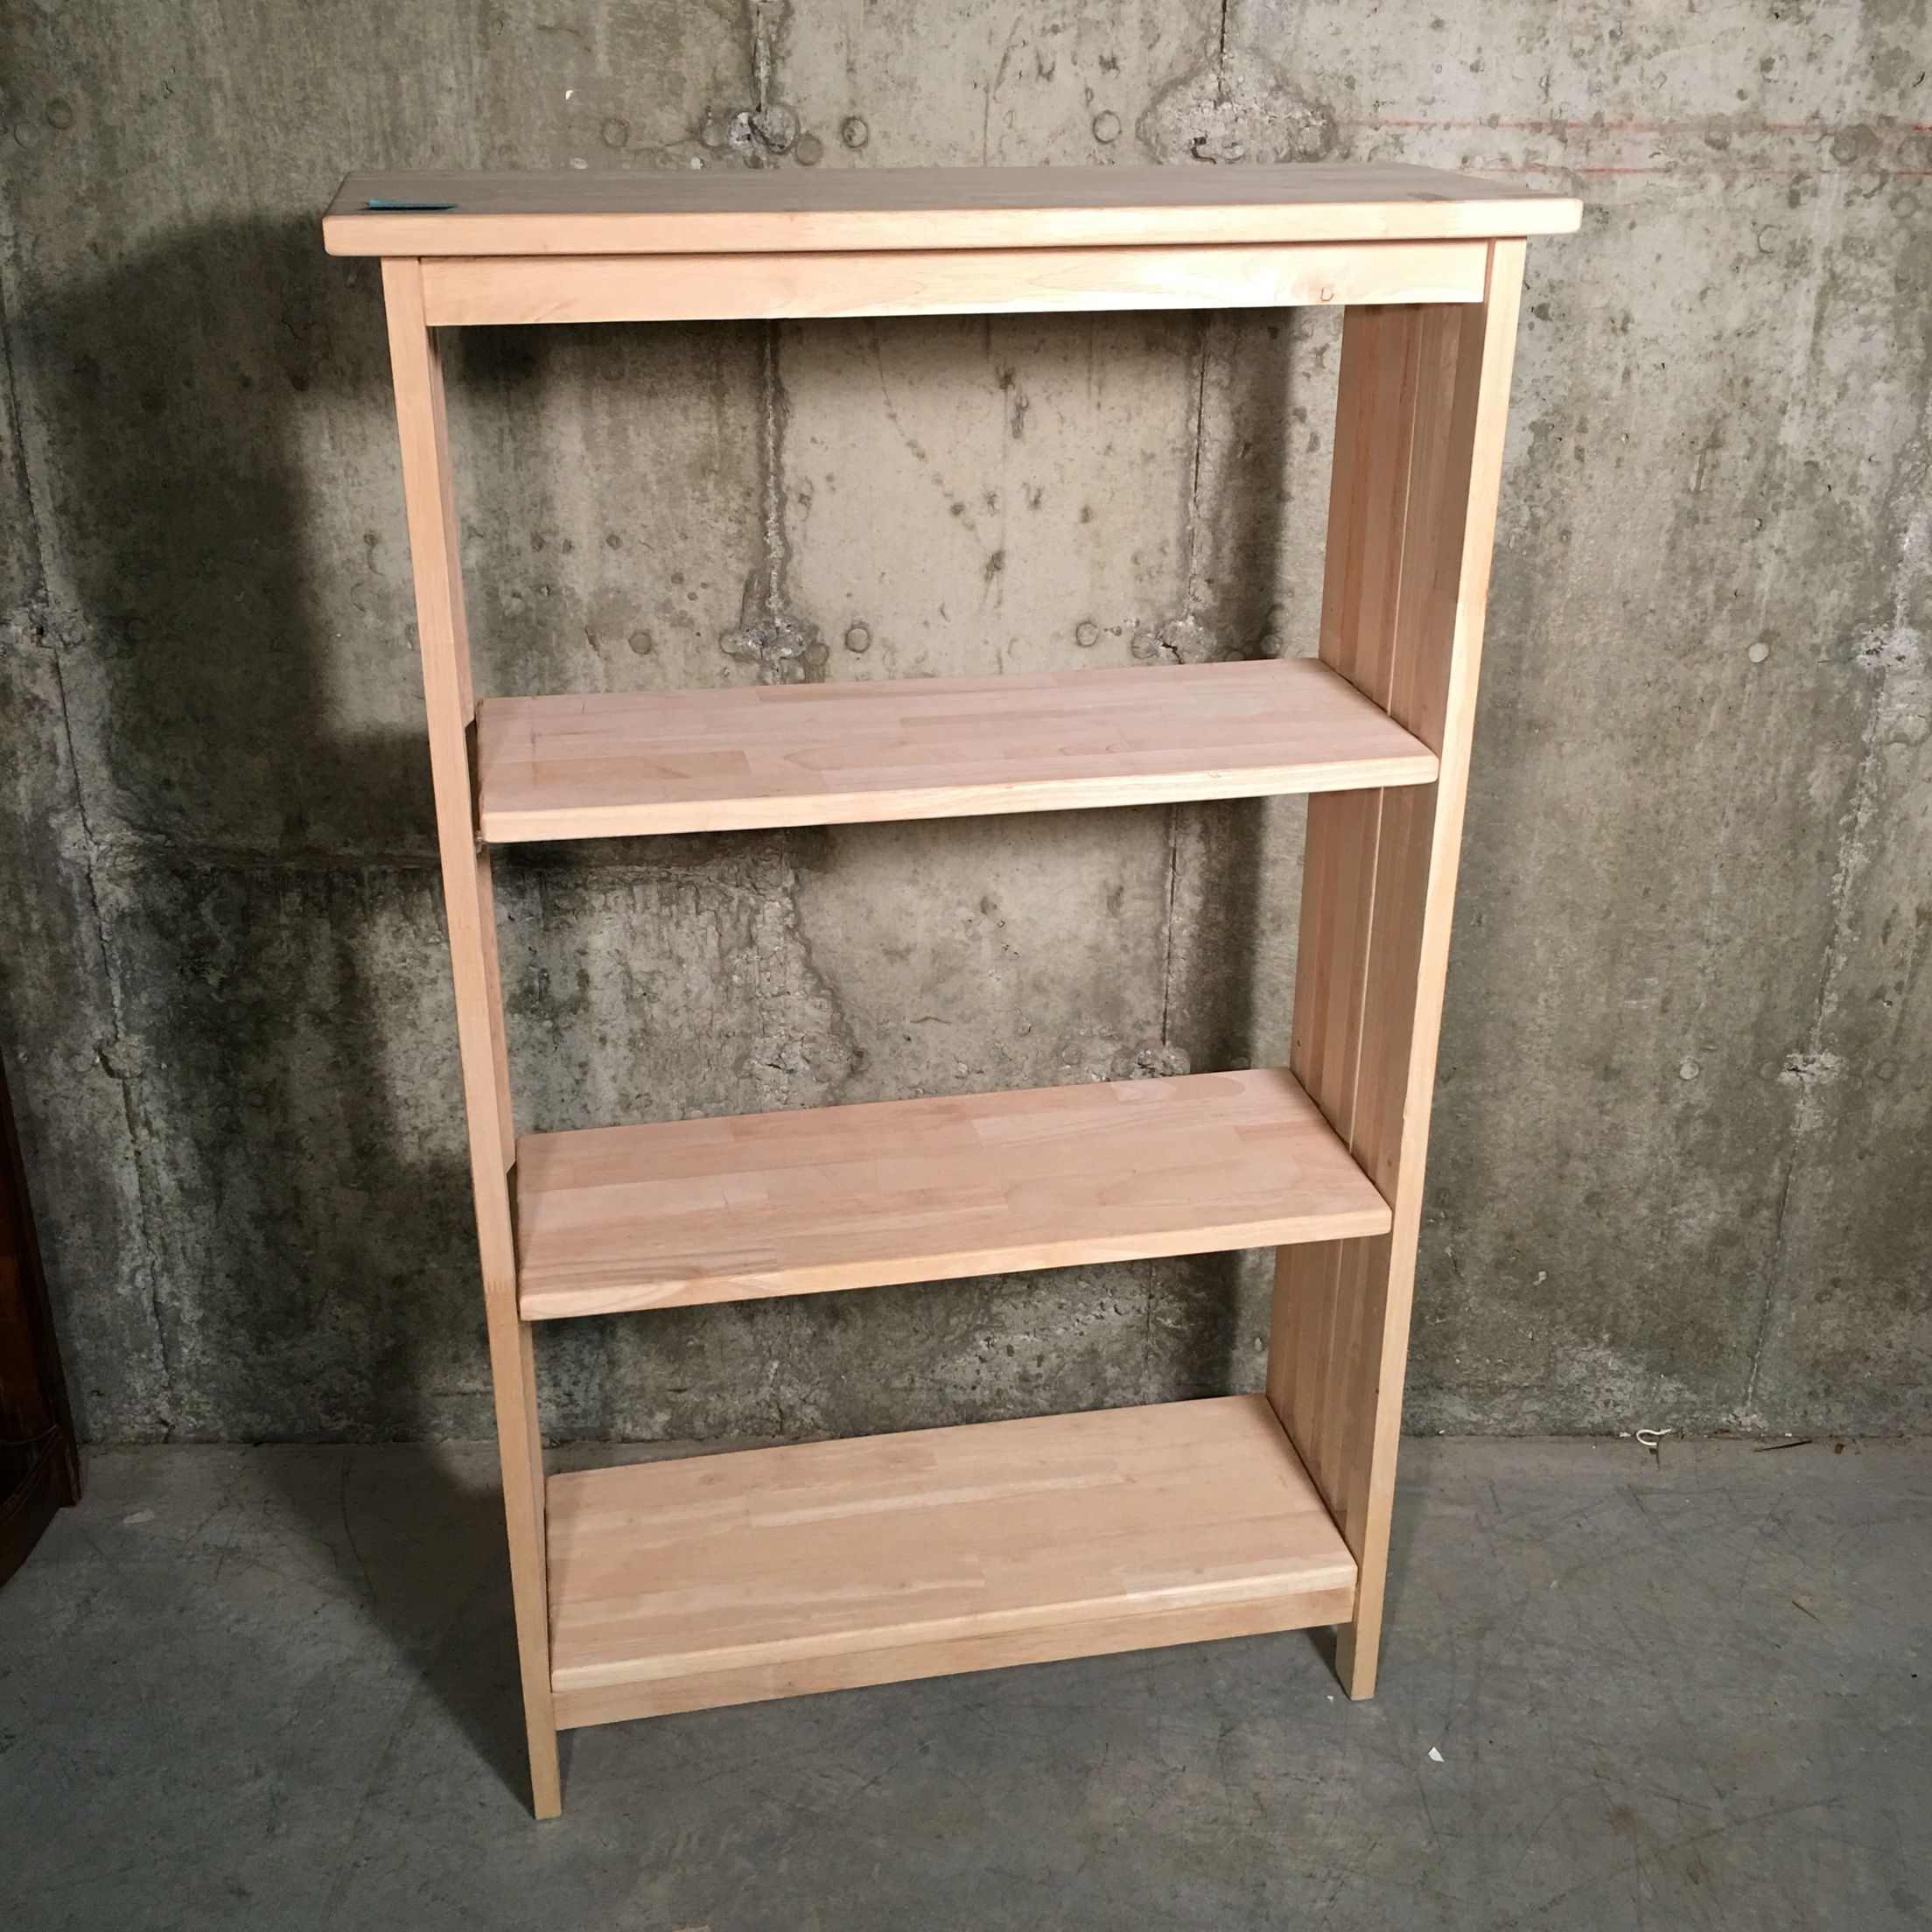 Natural Wood Bookshelf 55 2 Adjustable Shelves 30 Wide X 12 Deep X 48 Tall Item 439 Paypal Deposits Now A Wood Bookshelves Adjustable Shelving Shelves